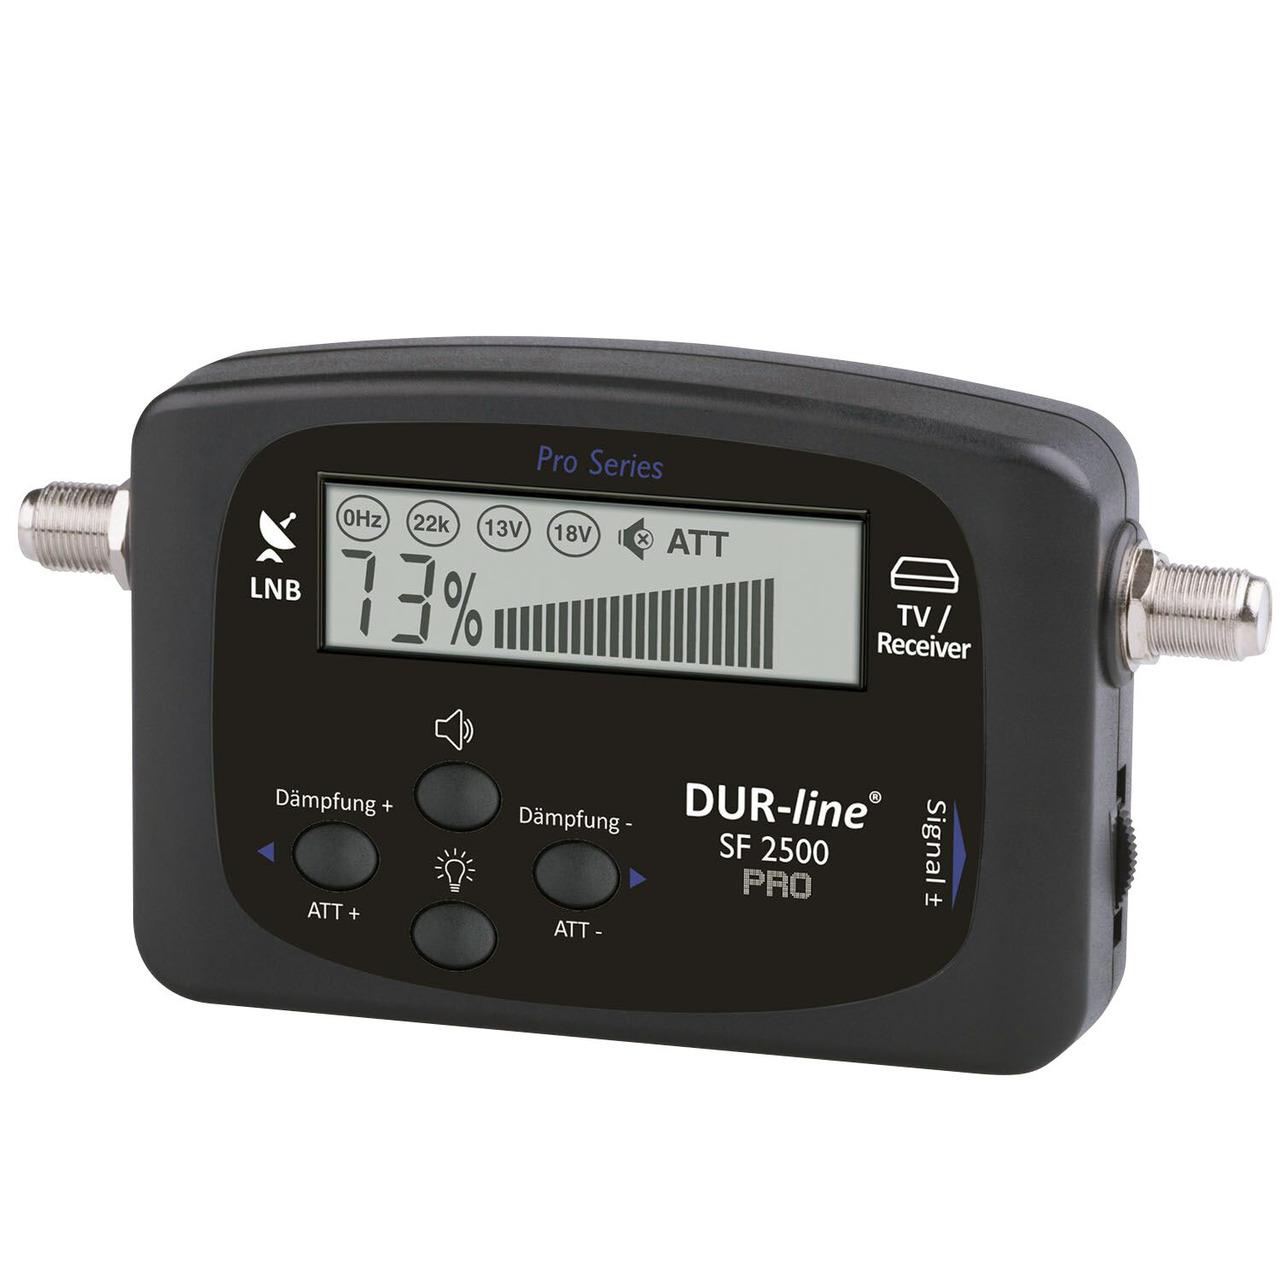 DUR-Line Satfinder SF 2500 Pro- DVB-S/S2-  inkl. Sat-Verbindungskabel (21 cm)